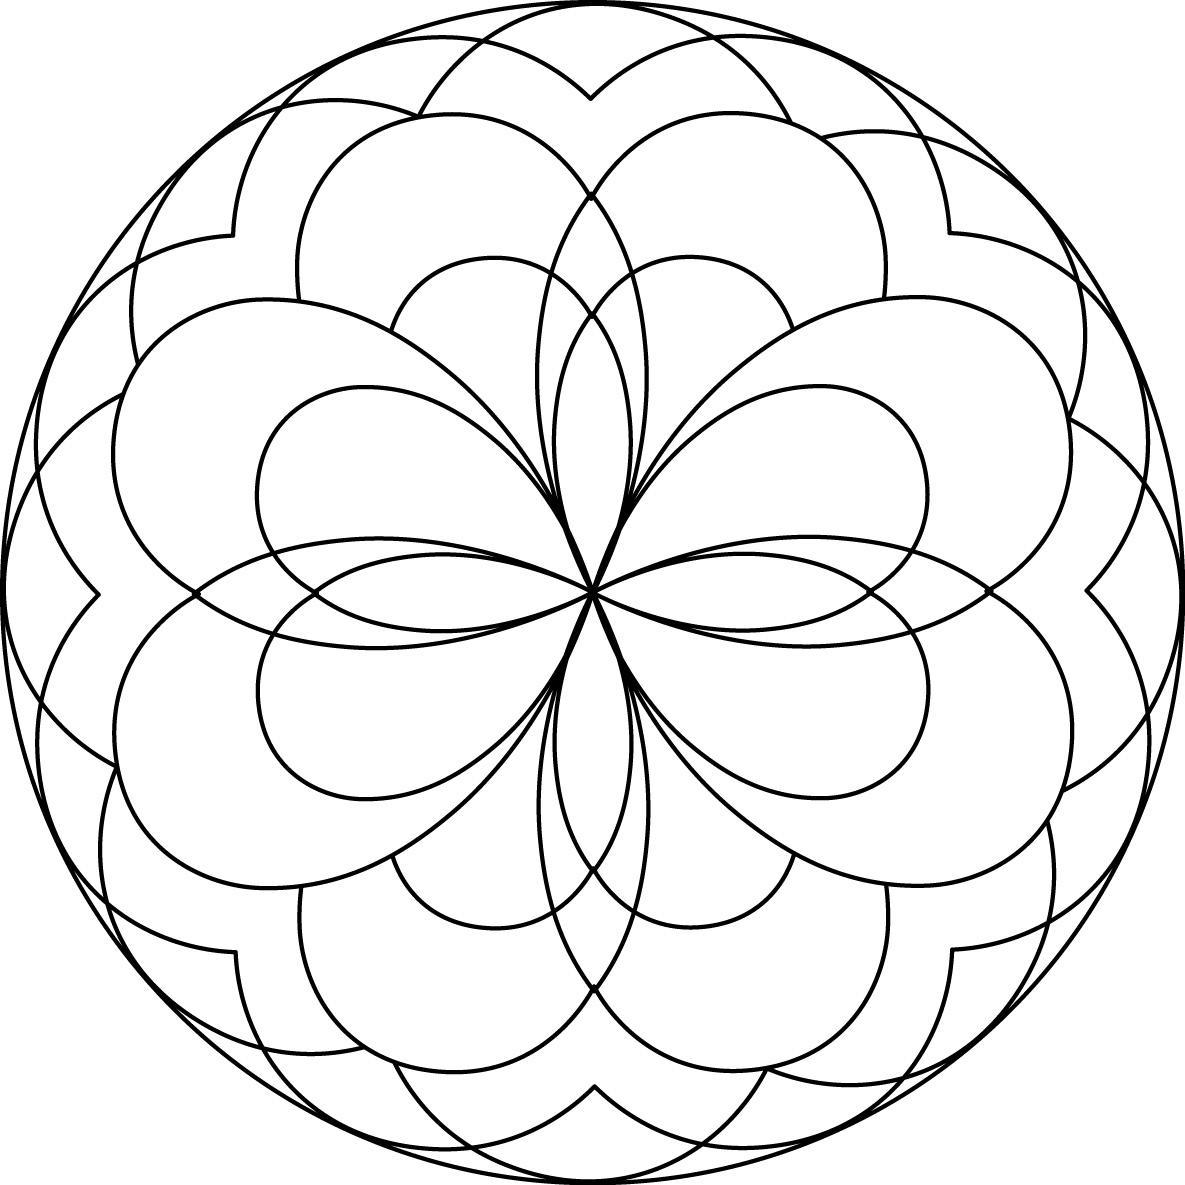 1185x1185 Mandalas For Children Centrum Mandala